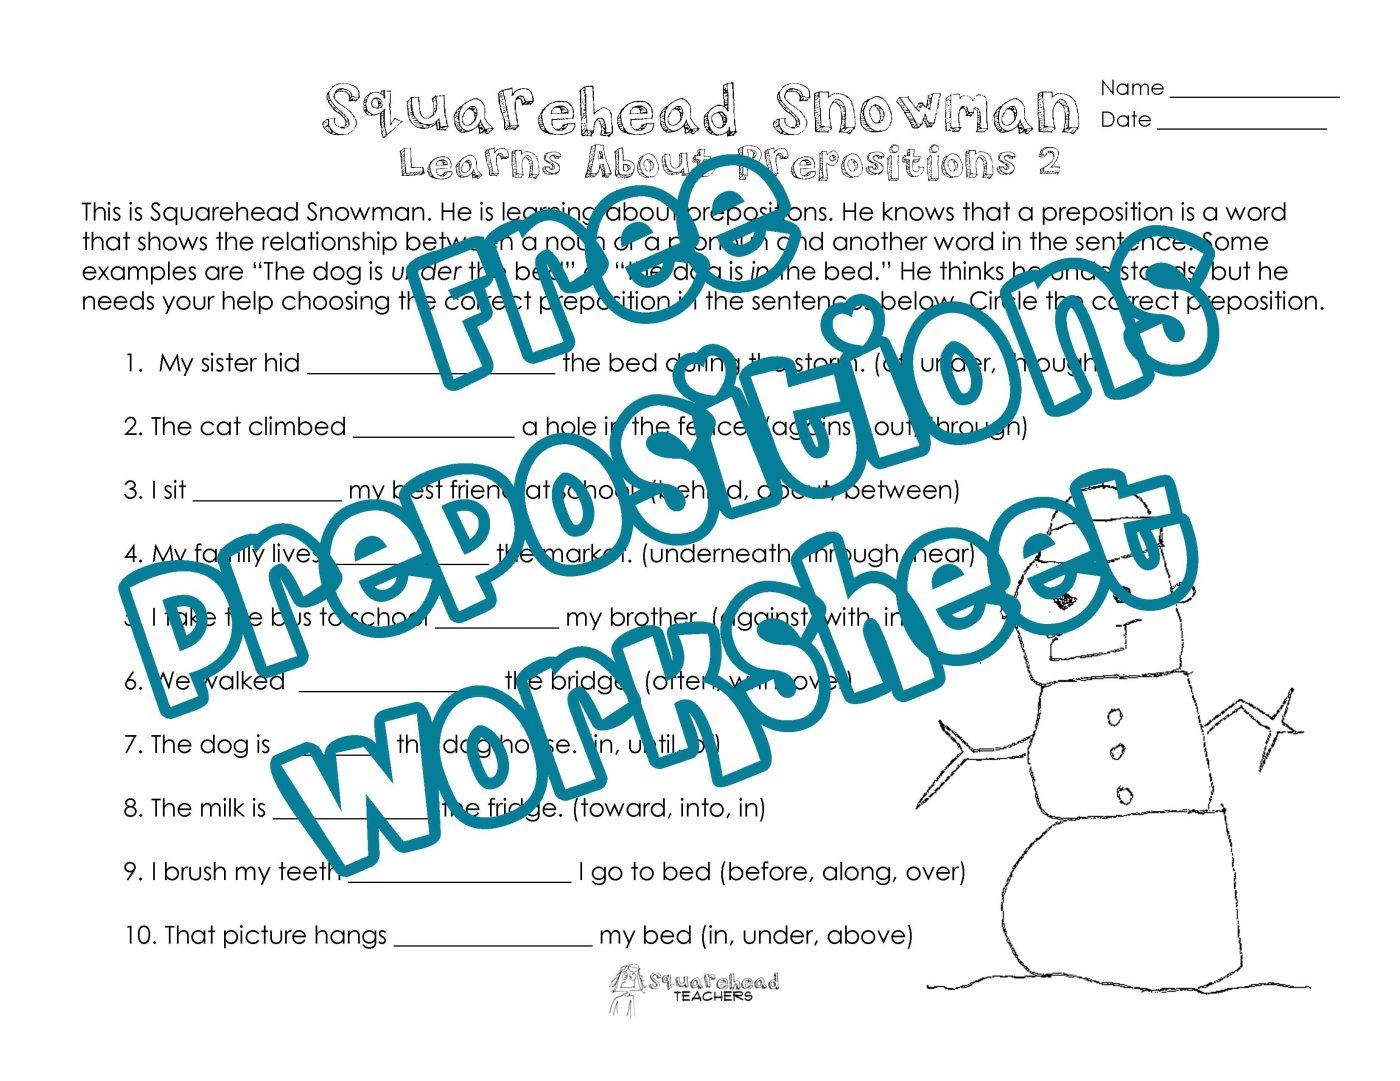 worksheet Prepositions Worksheet Pdf squarehead snowman prepositions practice 2 teachers